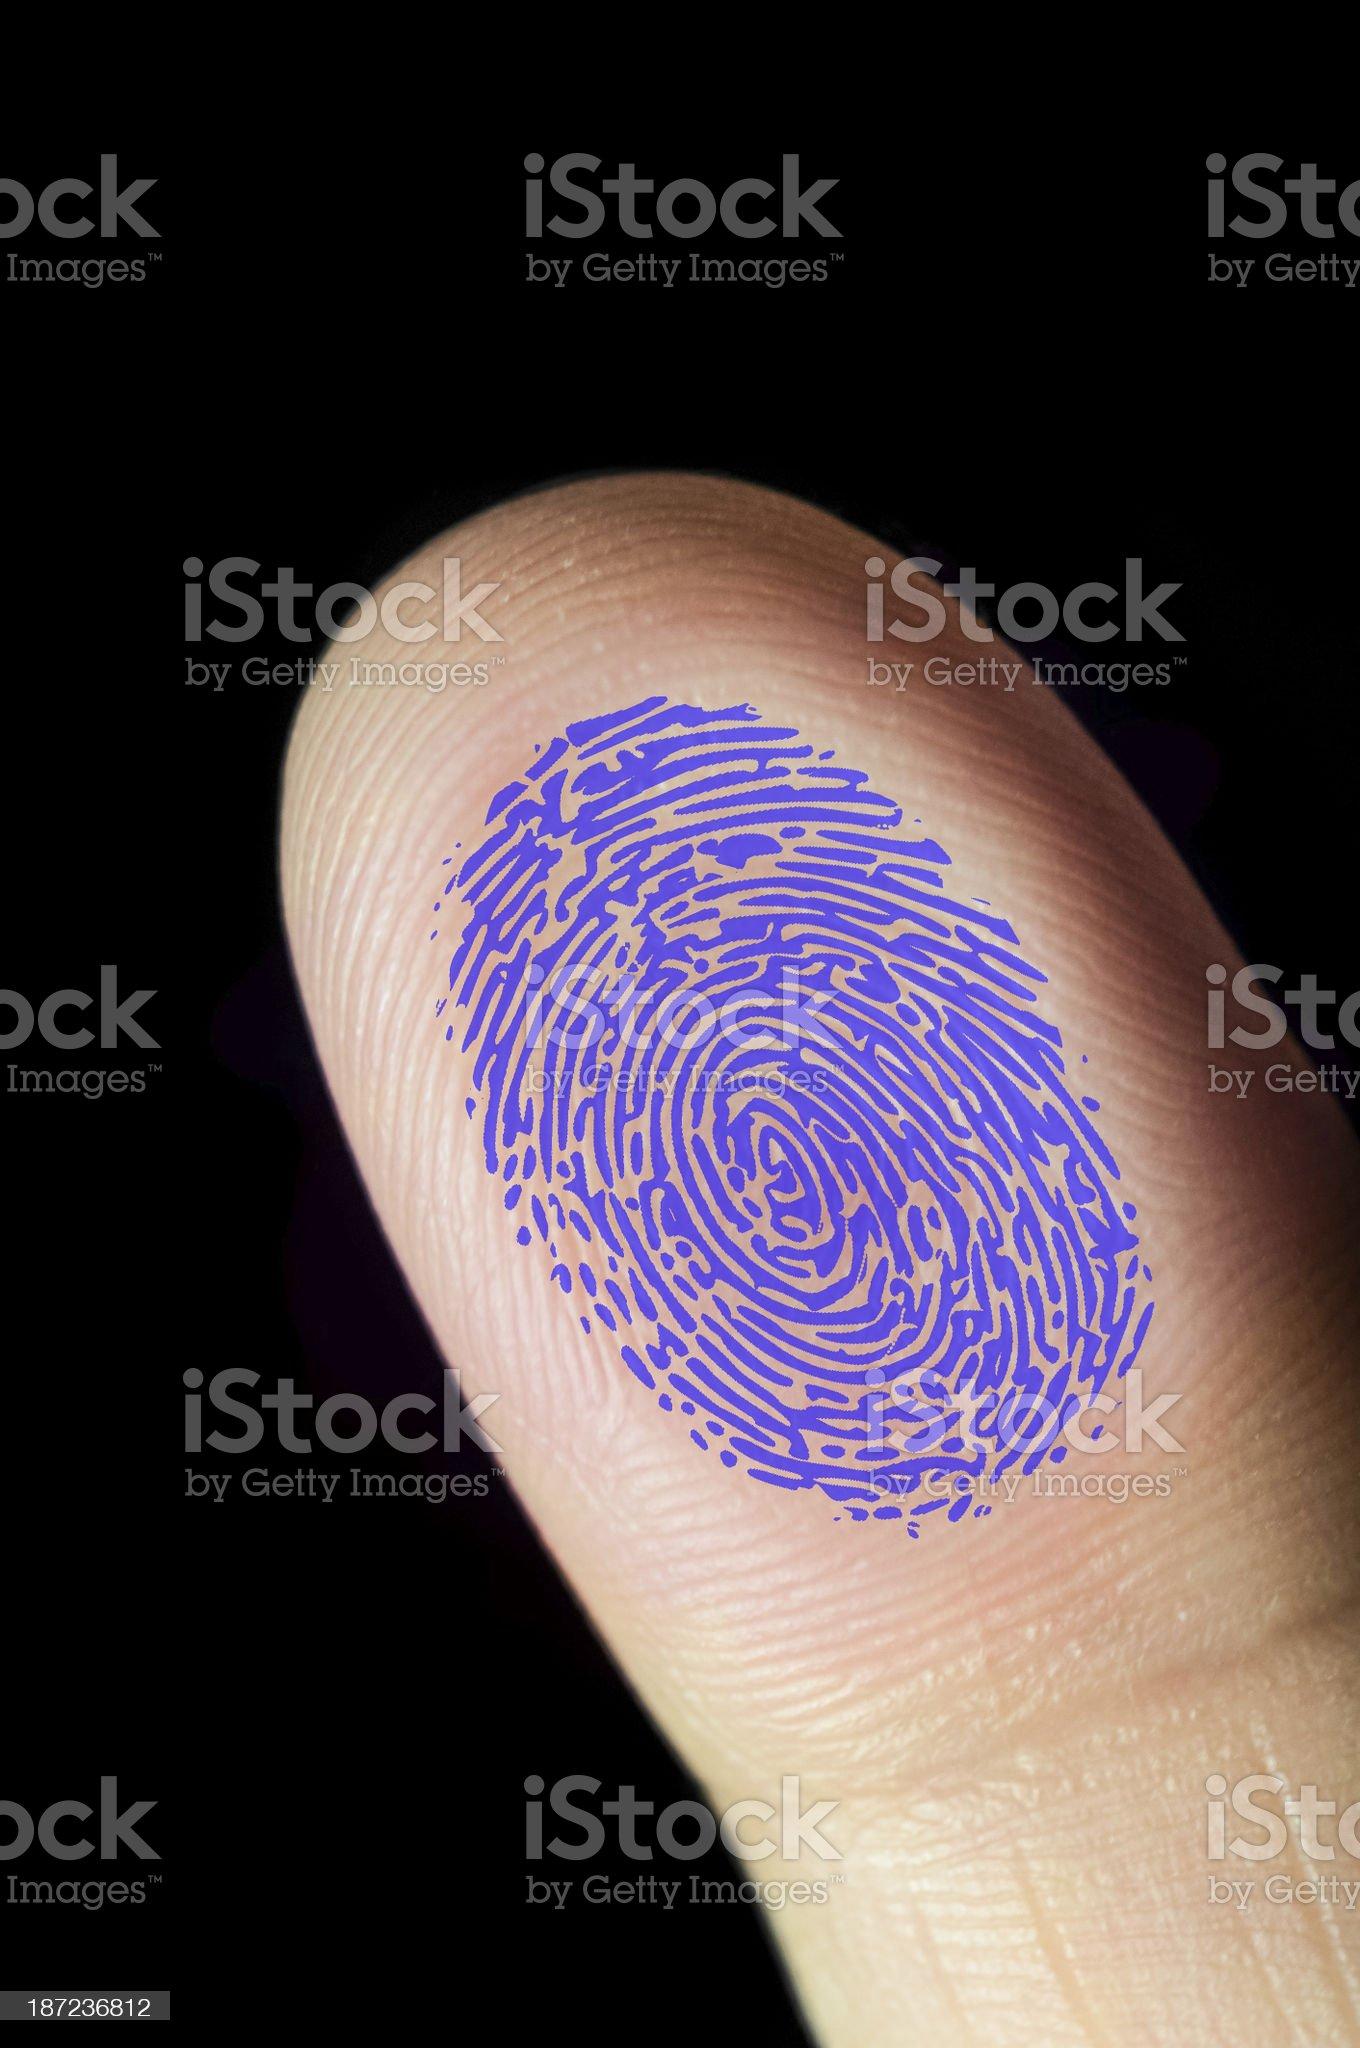 Fingerprint trace touching a glass royalty-free stock photo